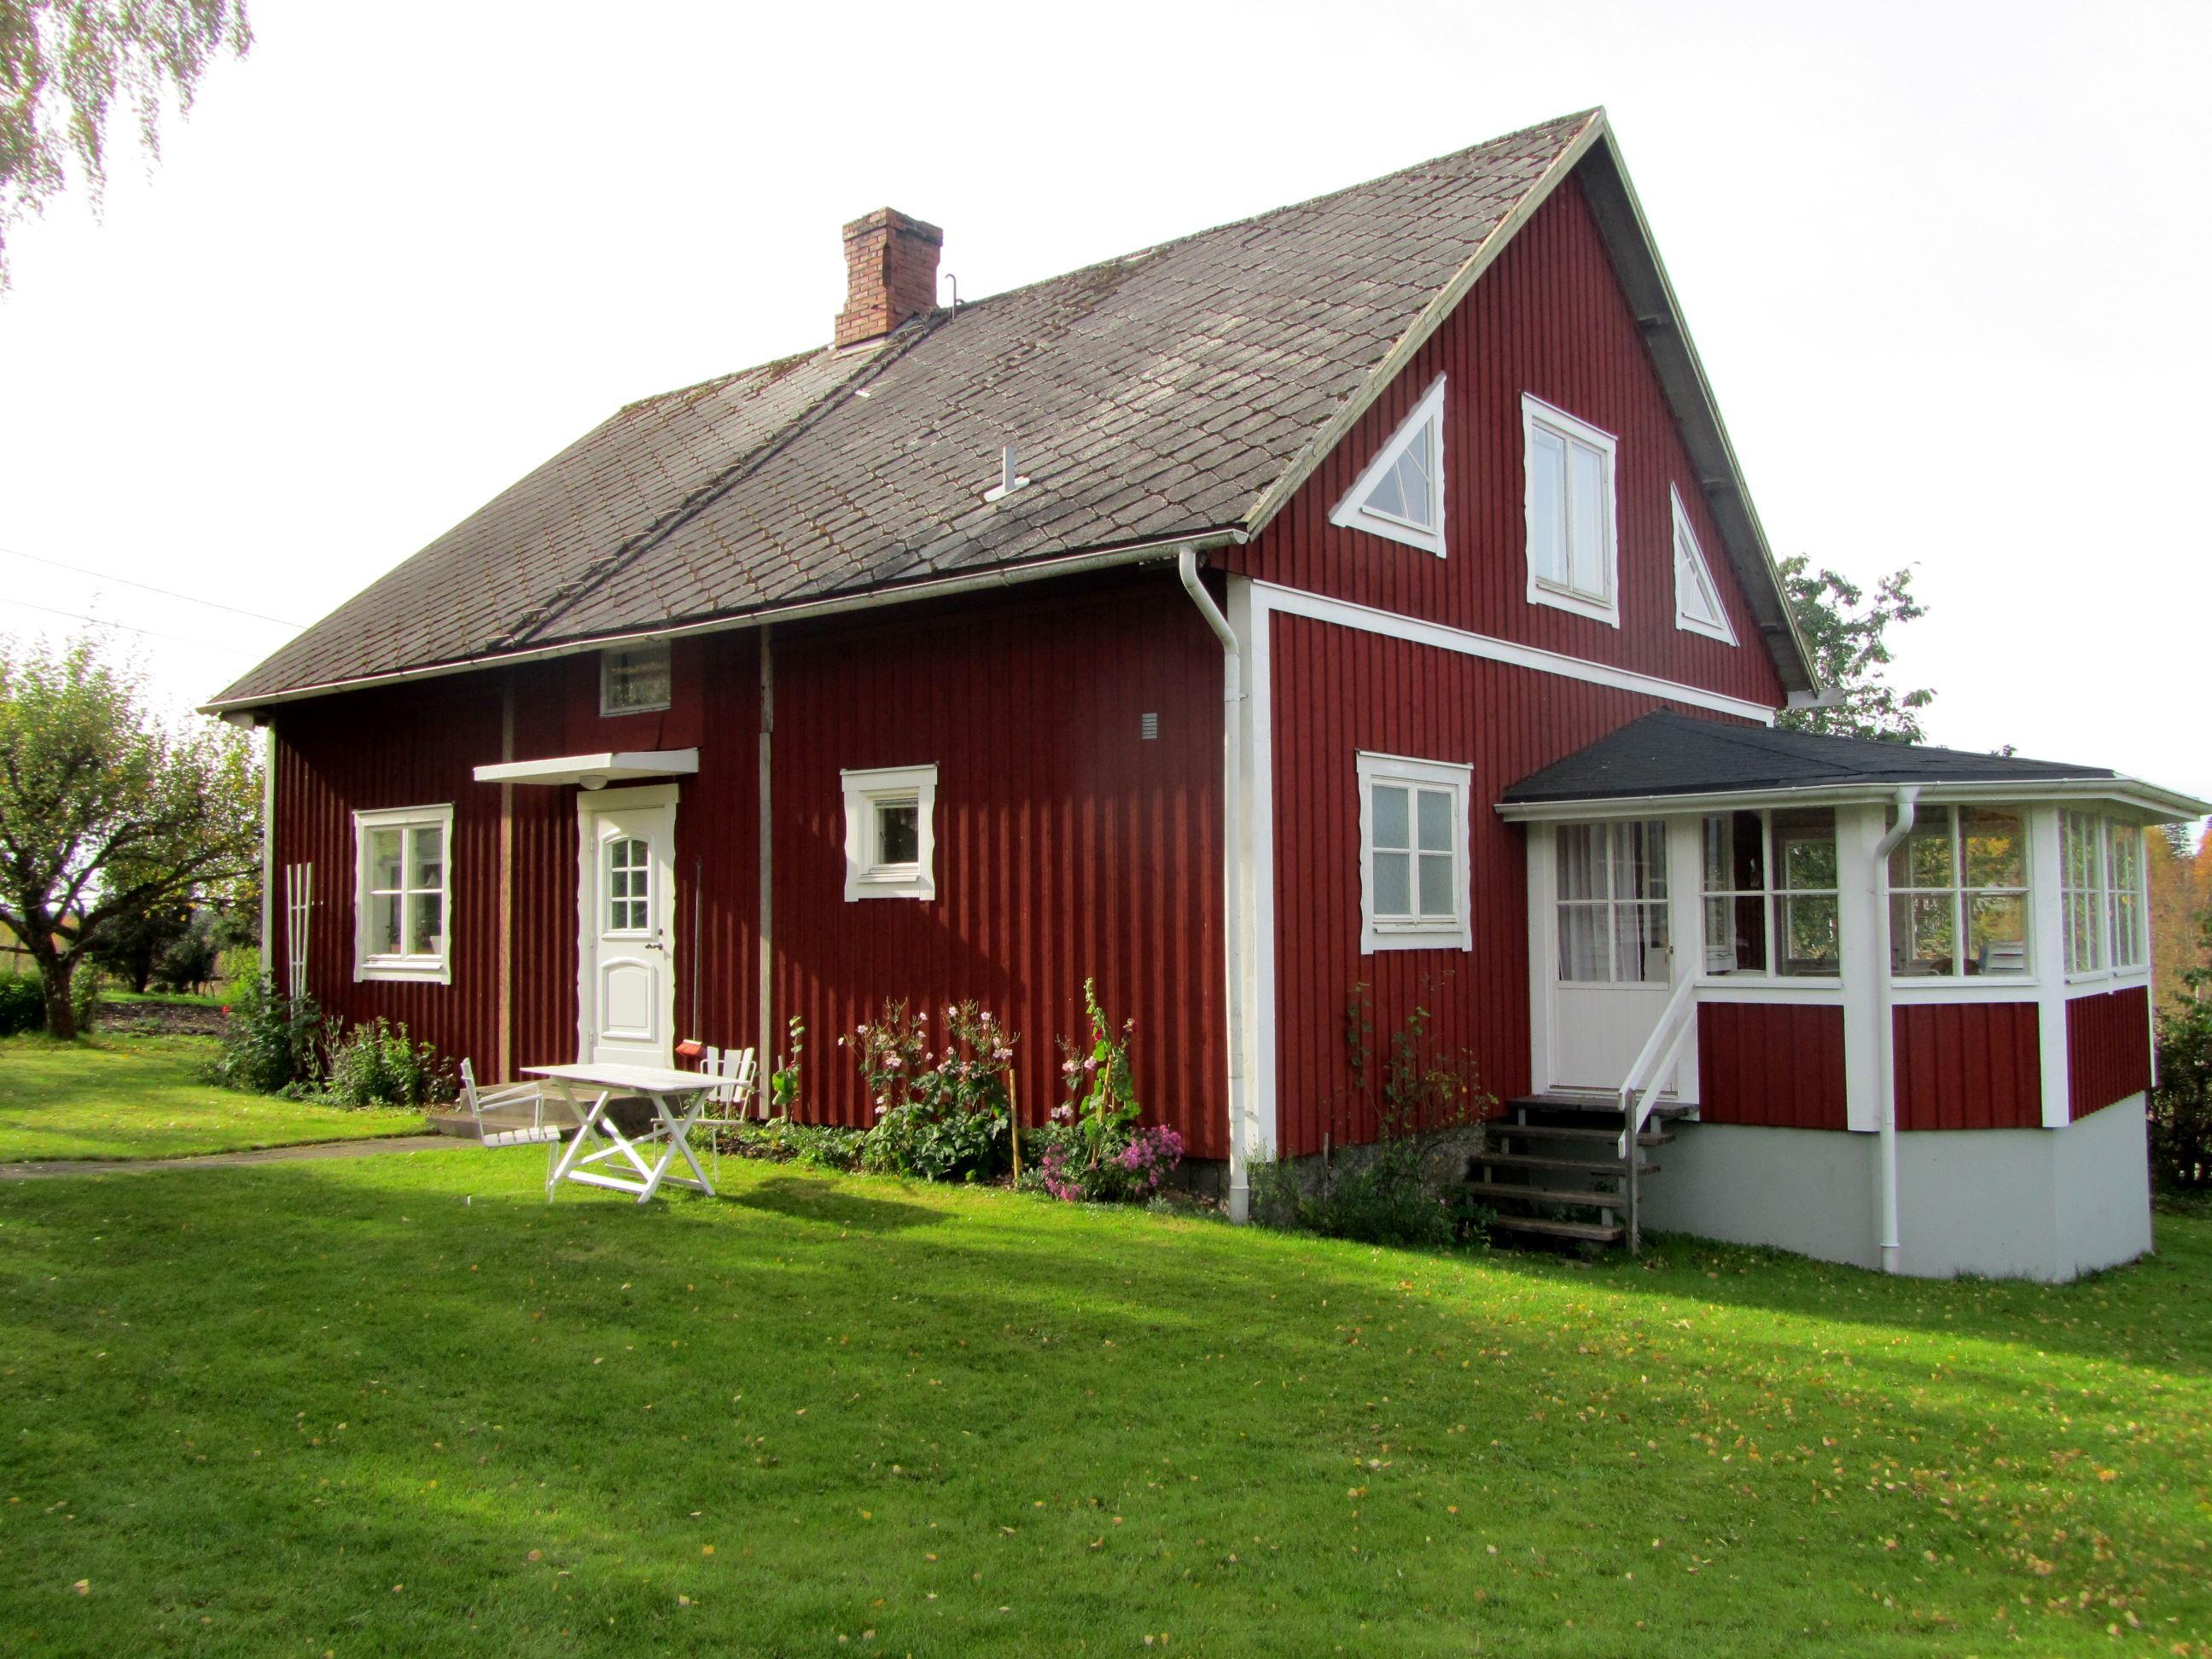 FS85049 Åskog, Korsberga